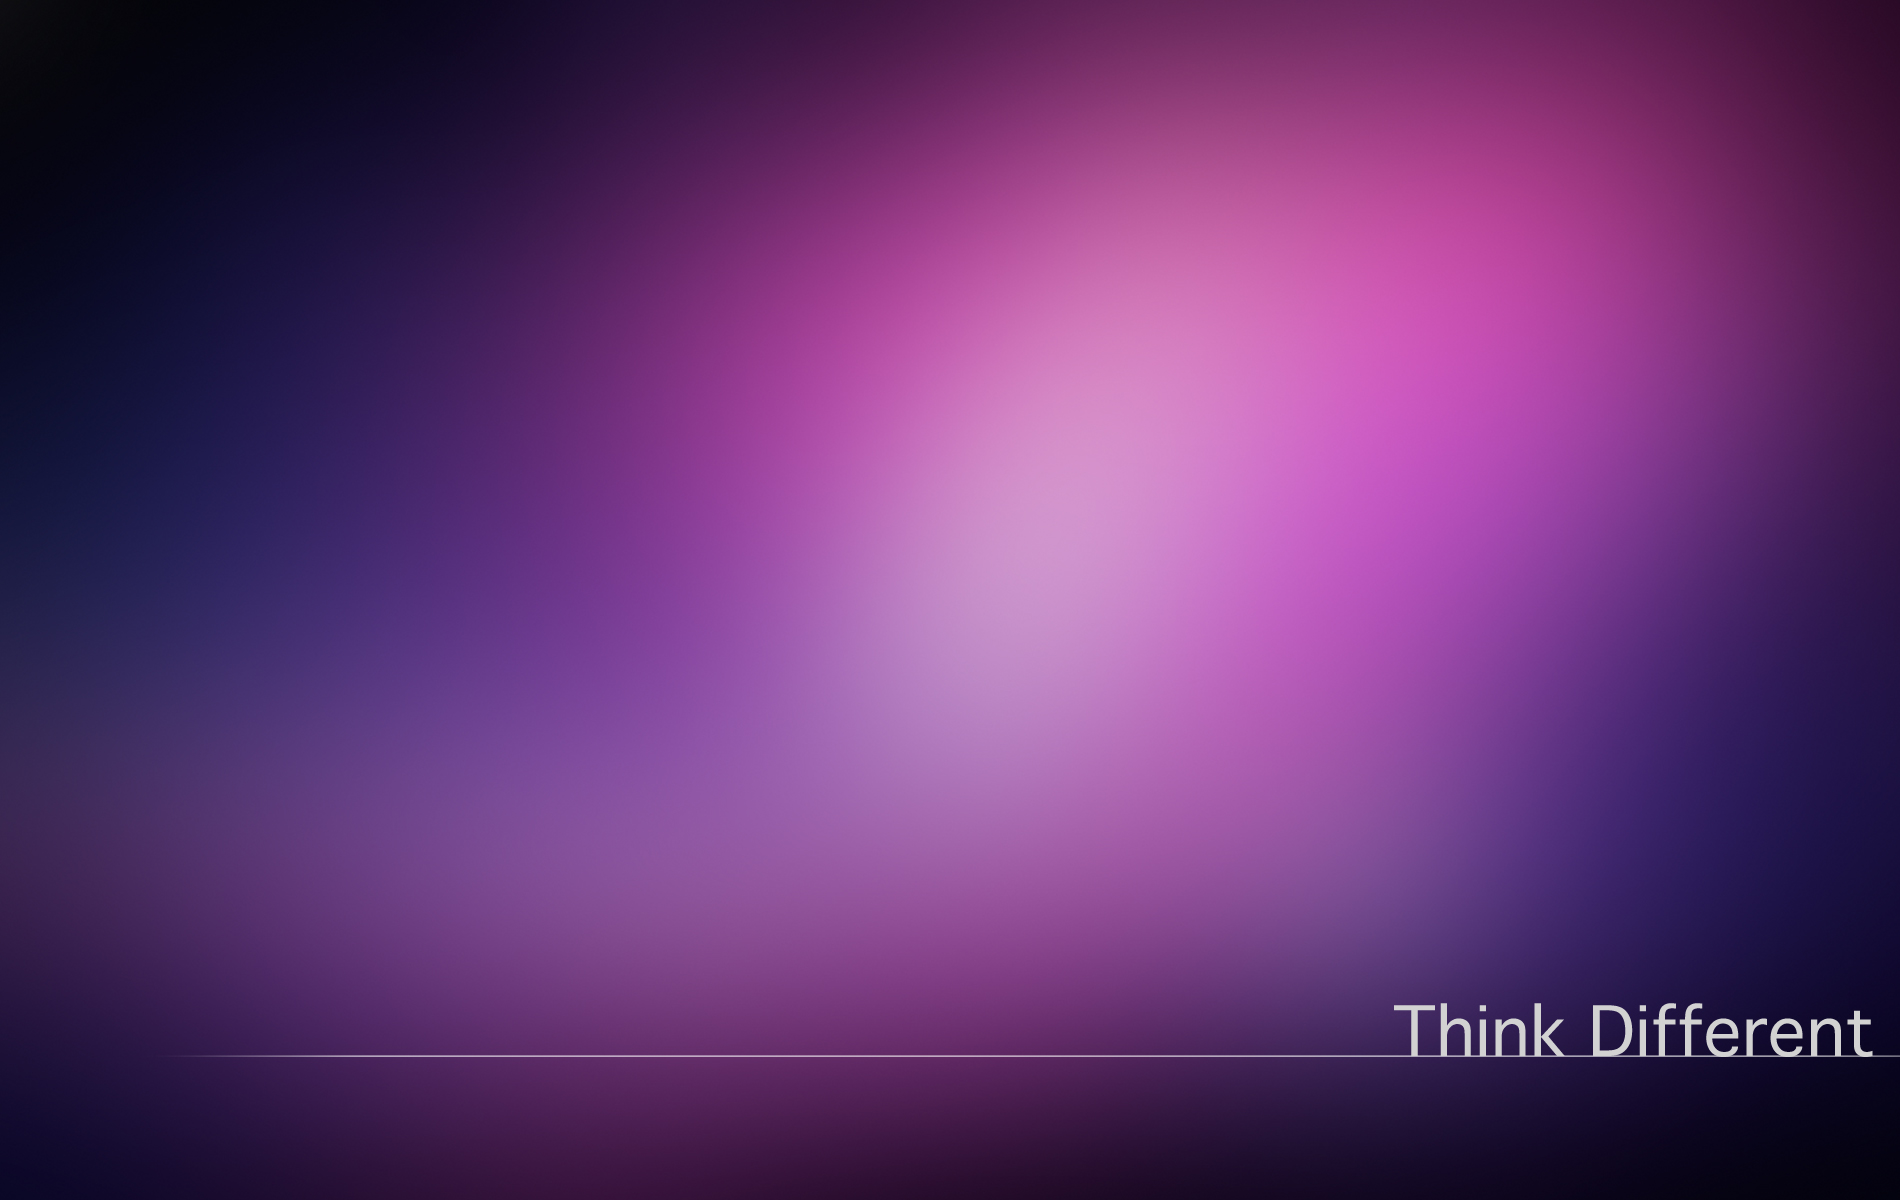 think different wallpaper by bigapple95 on deviantart